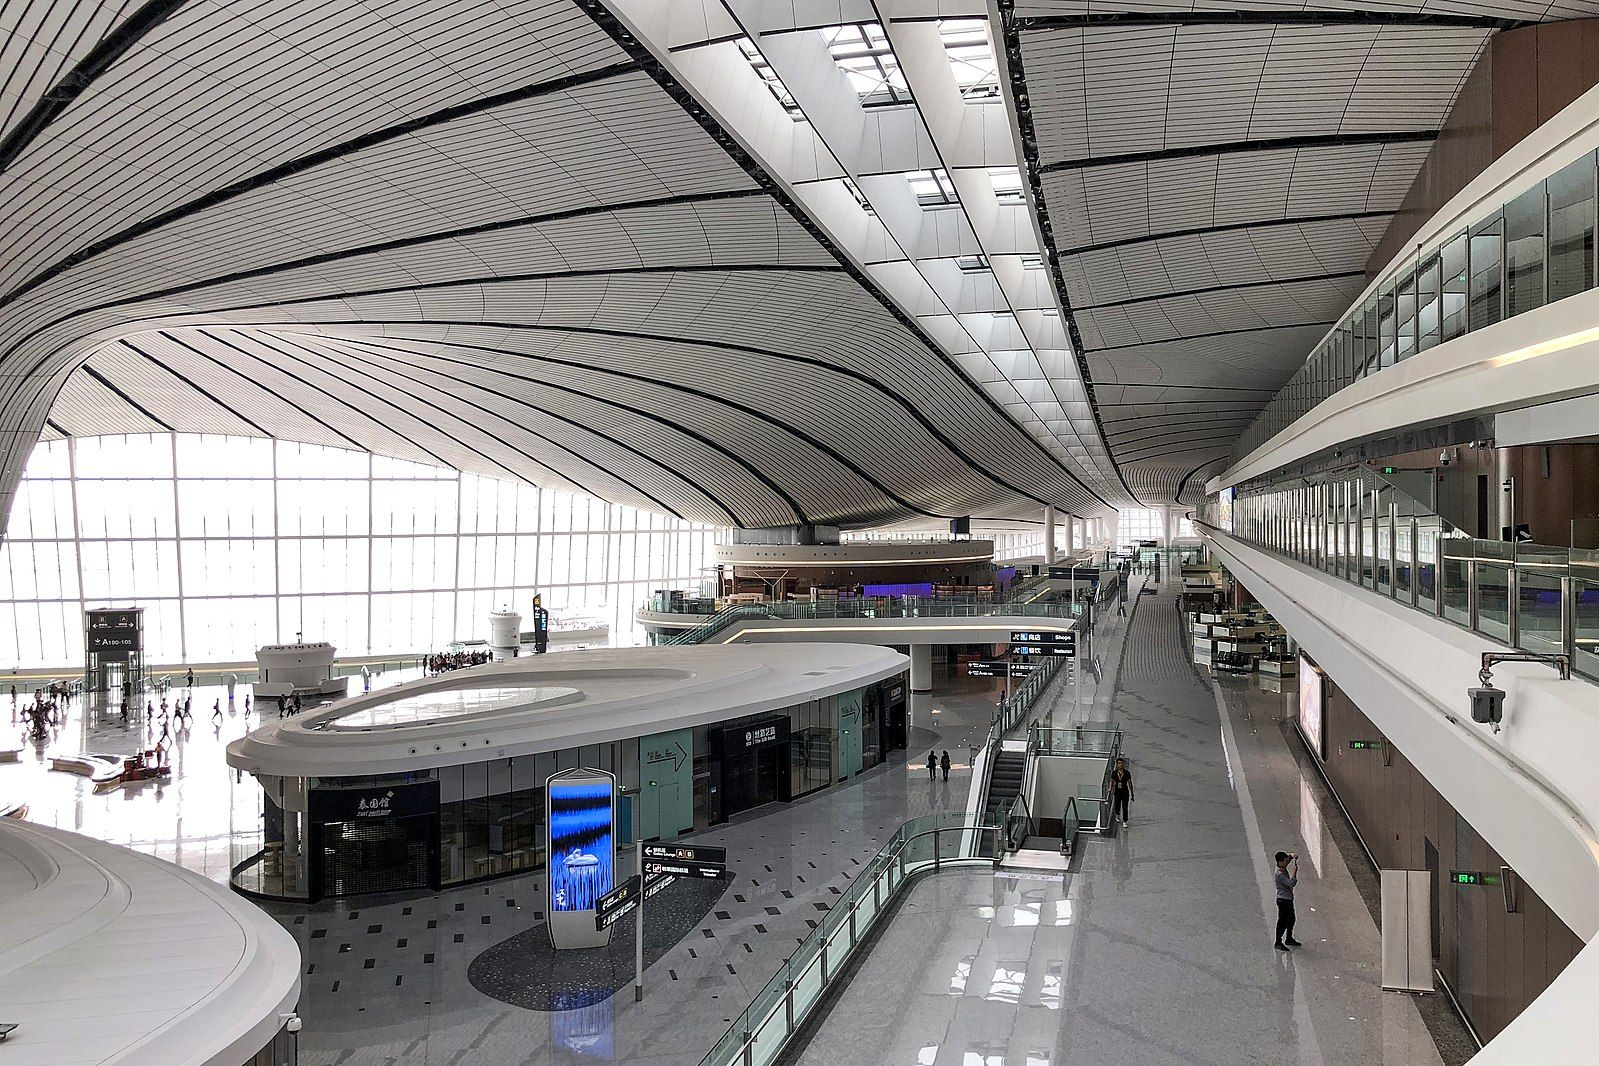 Beijing Daxing Airport Begins International Service